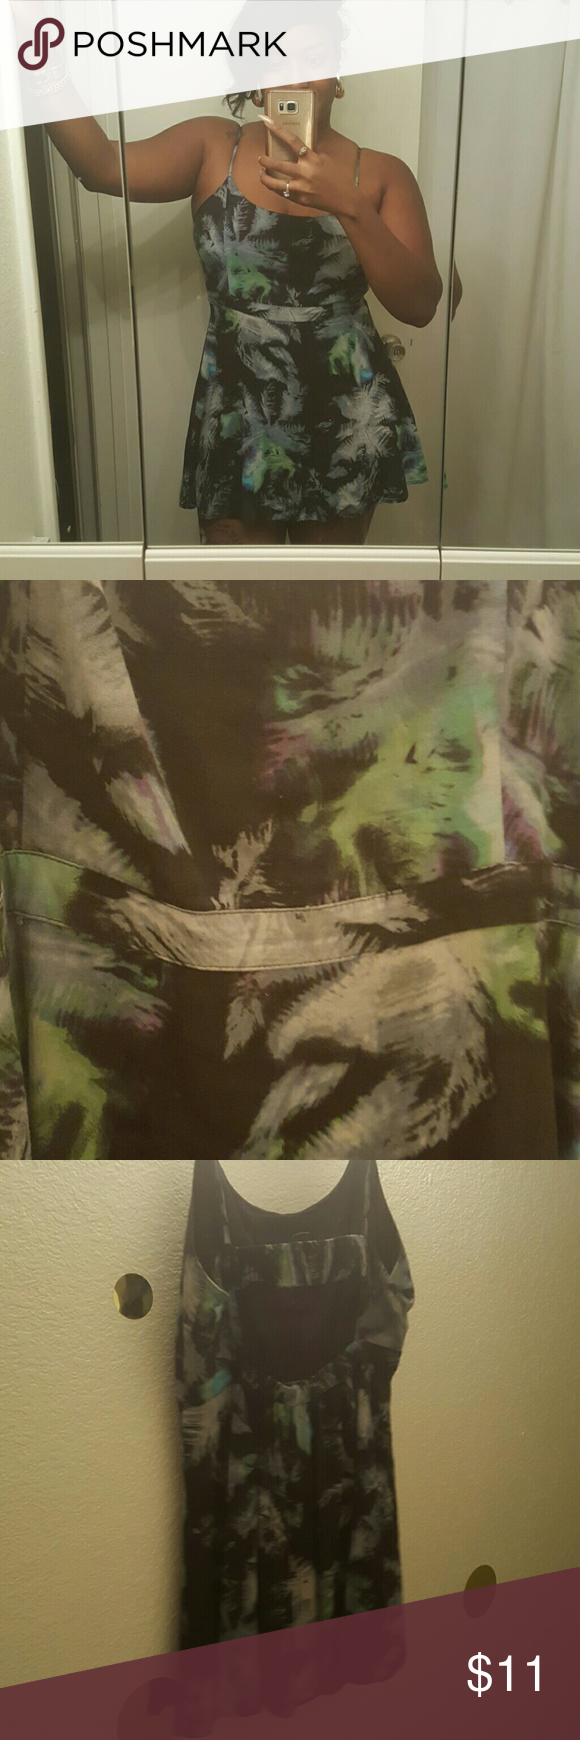 Tropical short sundress Absolutely stunning!! Open back strappy short sundress. Size L Dresses Midi #shortsundress